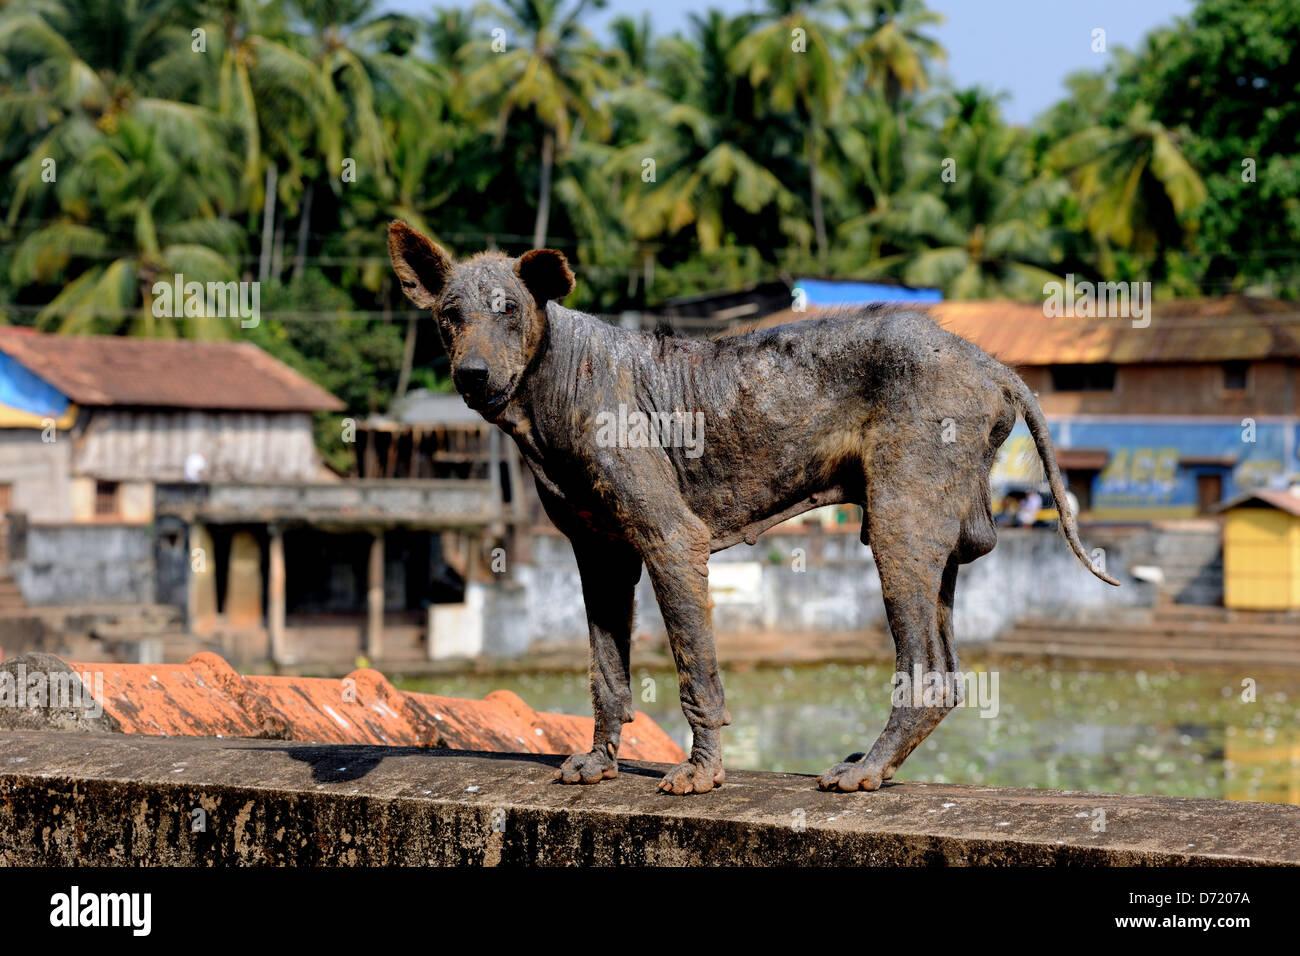 Sick dog,flea ridden,in India - Stock Image